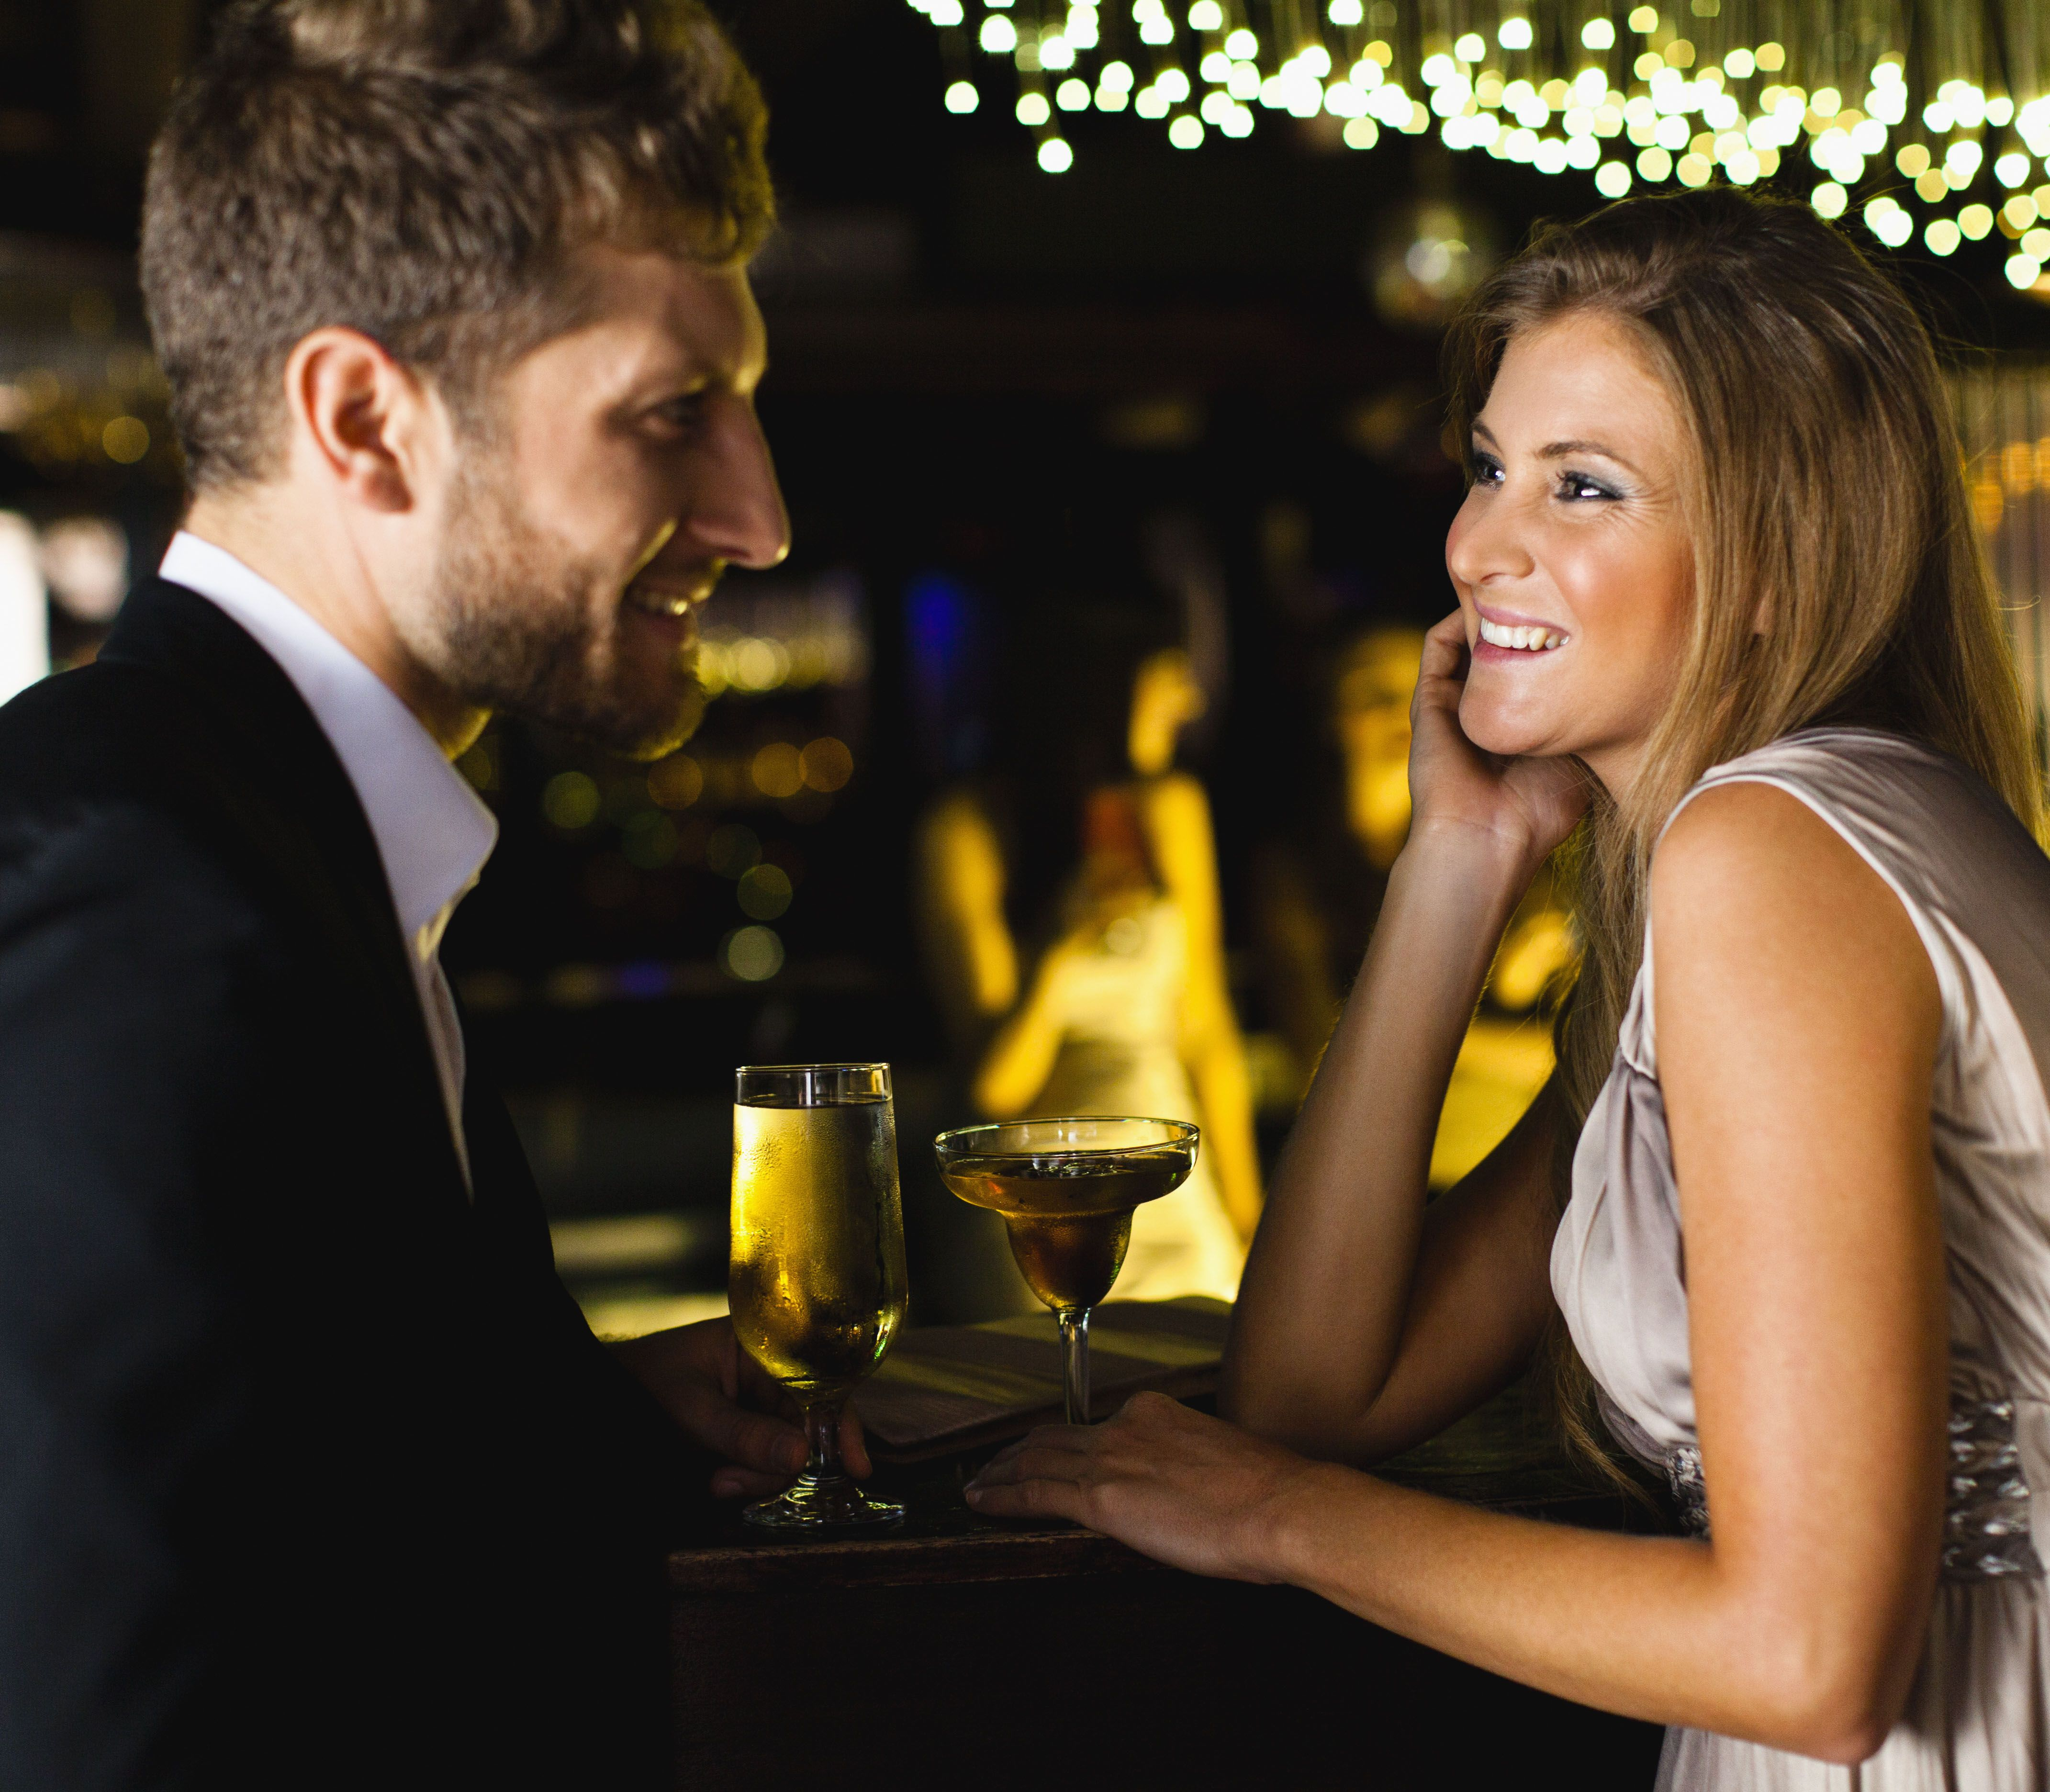 ontmoetingen dating populair Singapore populaire dating app